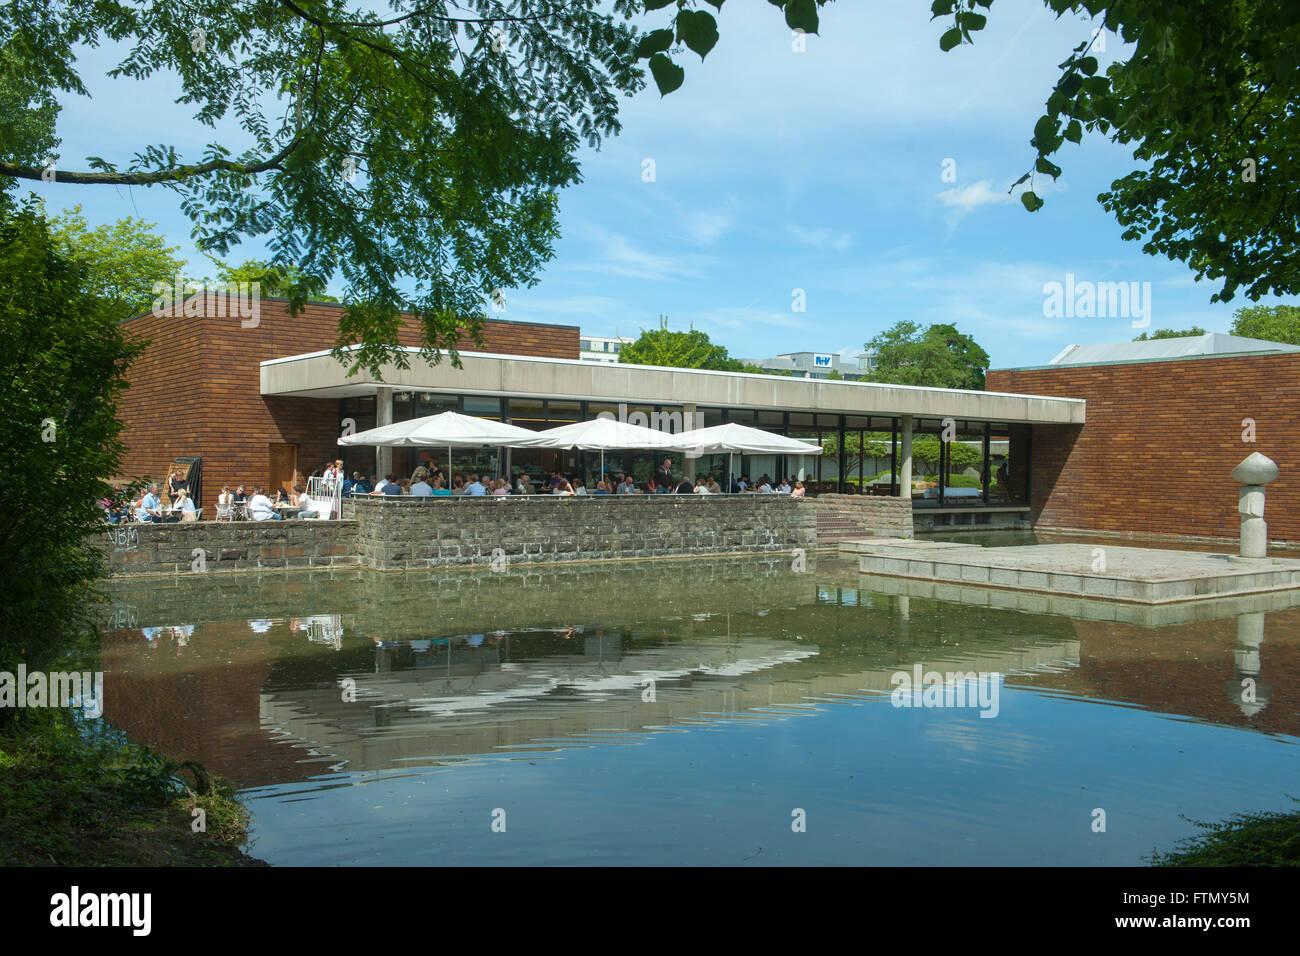 Köln, Ehrenfeld, Neustadt-Süd, Universitätsstrasse, Museum für ostasiatische Kunst Imagen De Stock